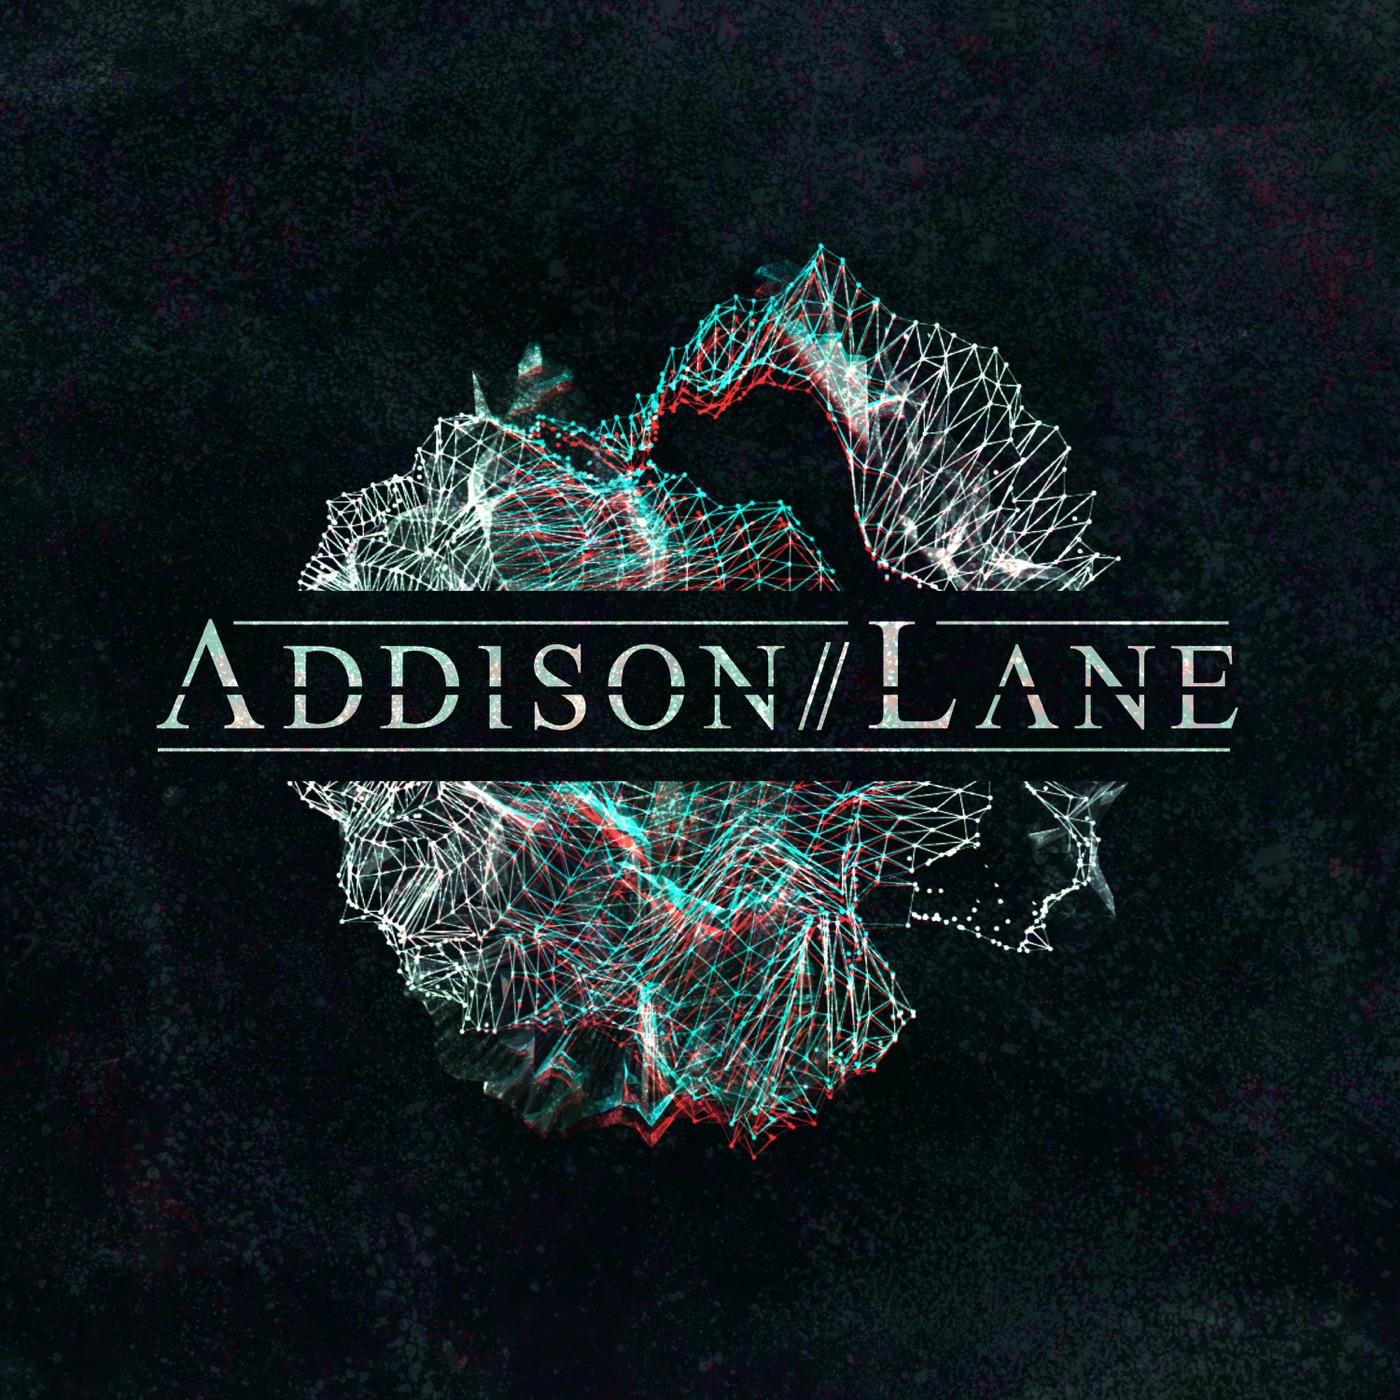 Addison//lane - Welcome Home [single] (2019)